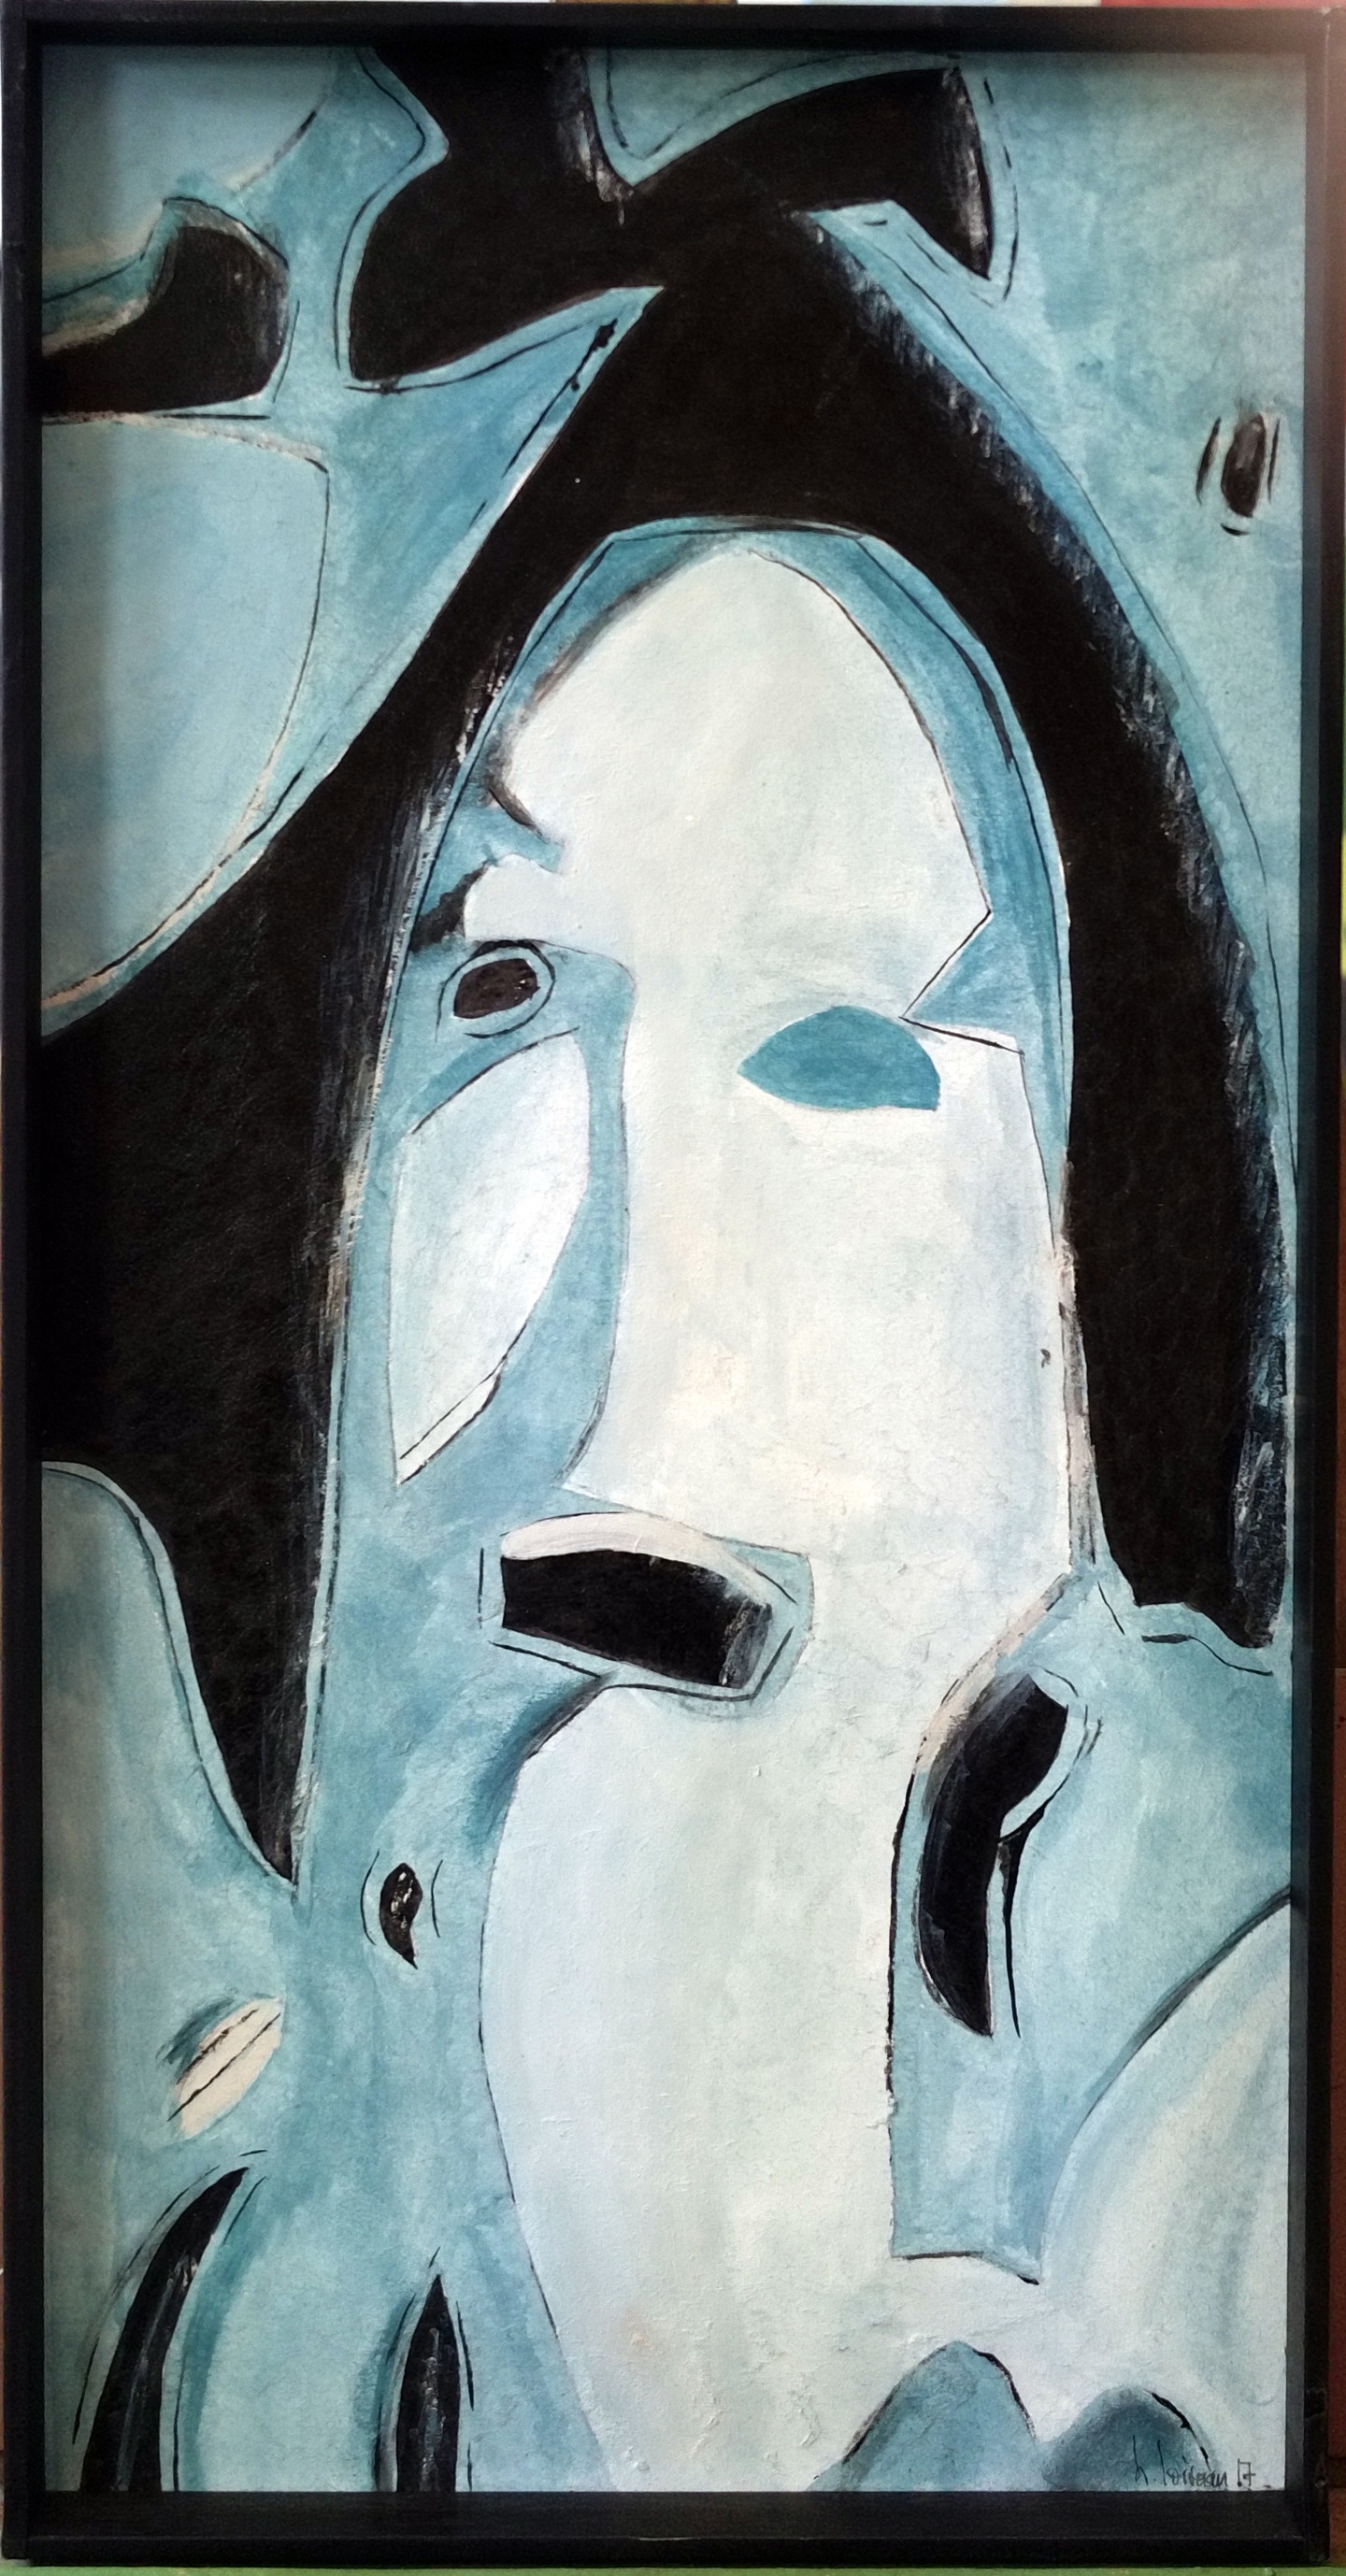 Hervé Loiseau - Femme bleu riante